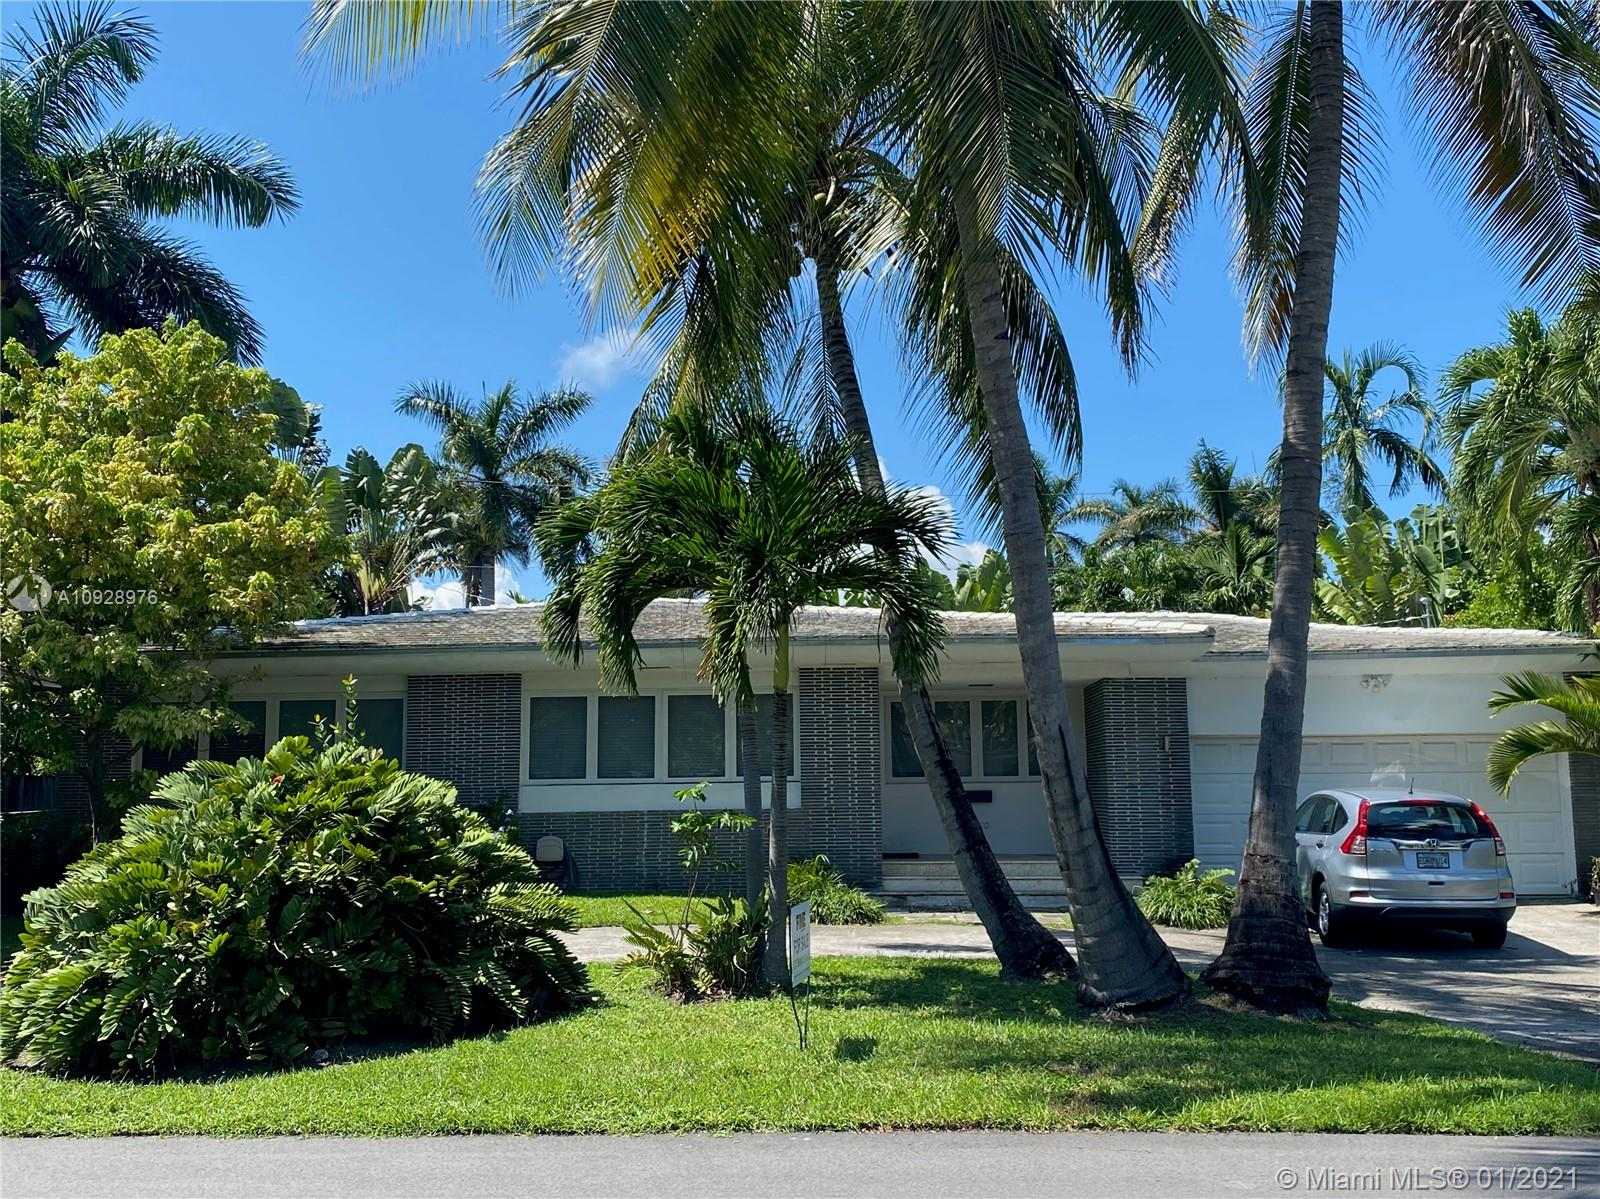 North Bay Island - 7720 Coquina Dr, North Bay Village, FL 33141